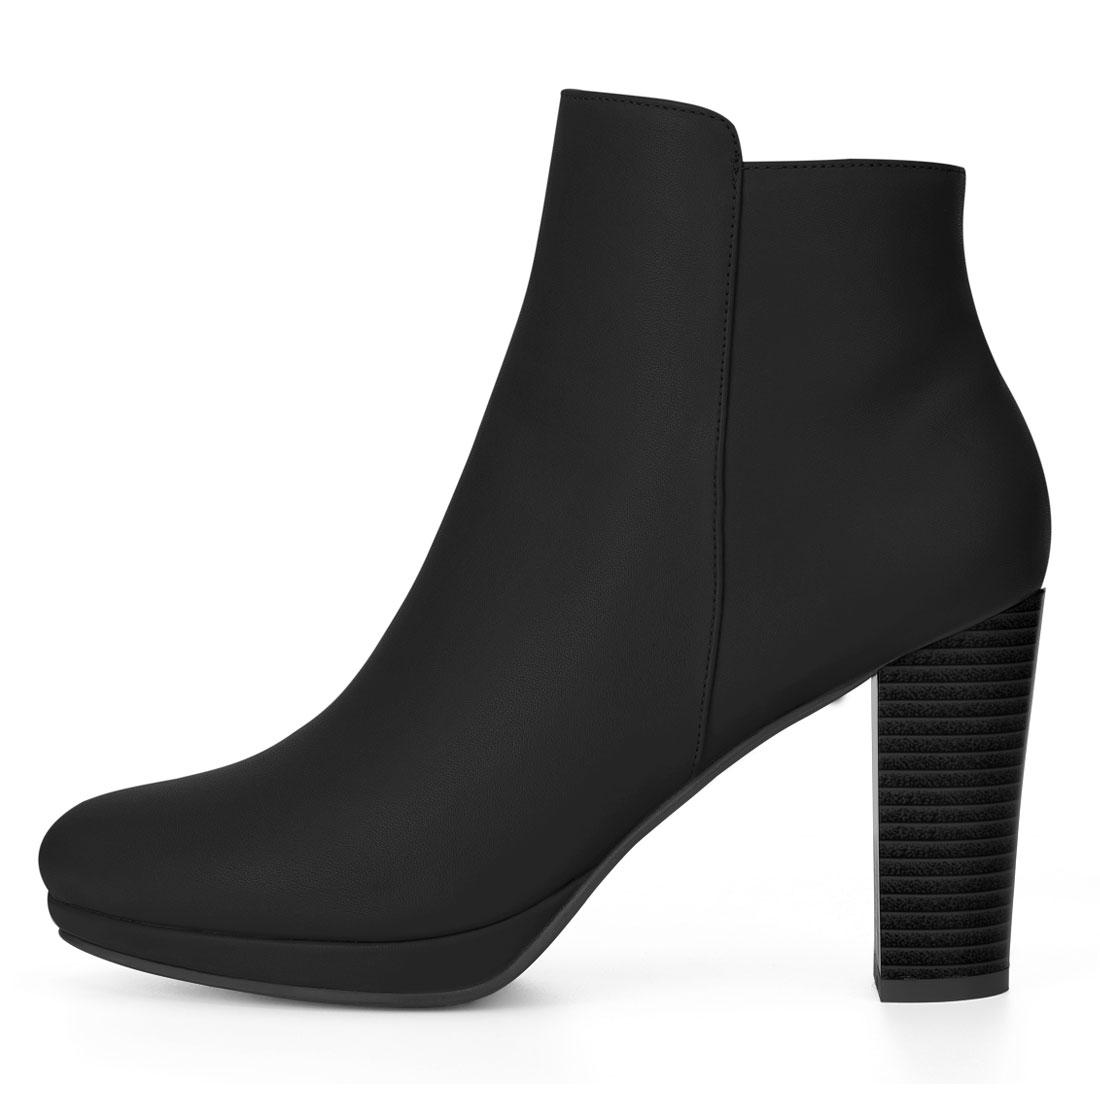 Allegra K Women Round Toe Chunky Heel Platform Ankle Boots Black US 9